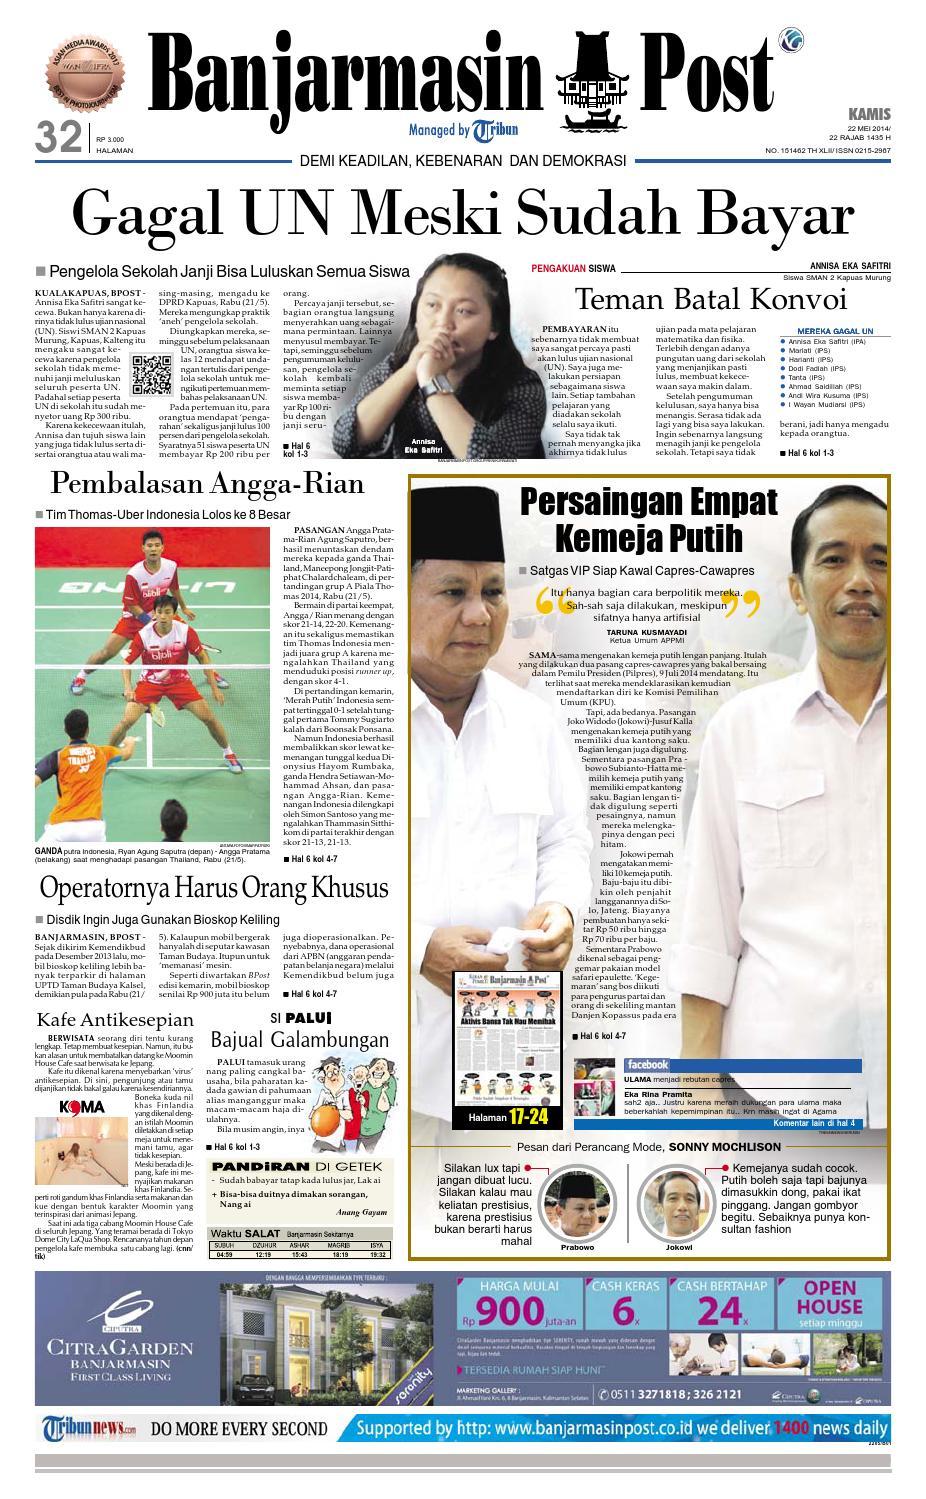 Banjarmasin Post Kamis 22 Mei 2014 By Issuu Produk Ukm Bumn Tenun Pagatan Atasan Wanita 4